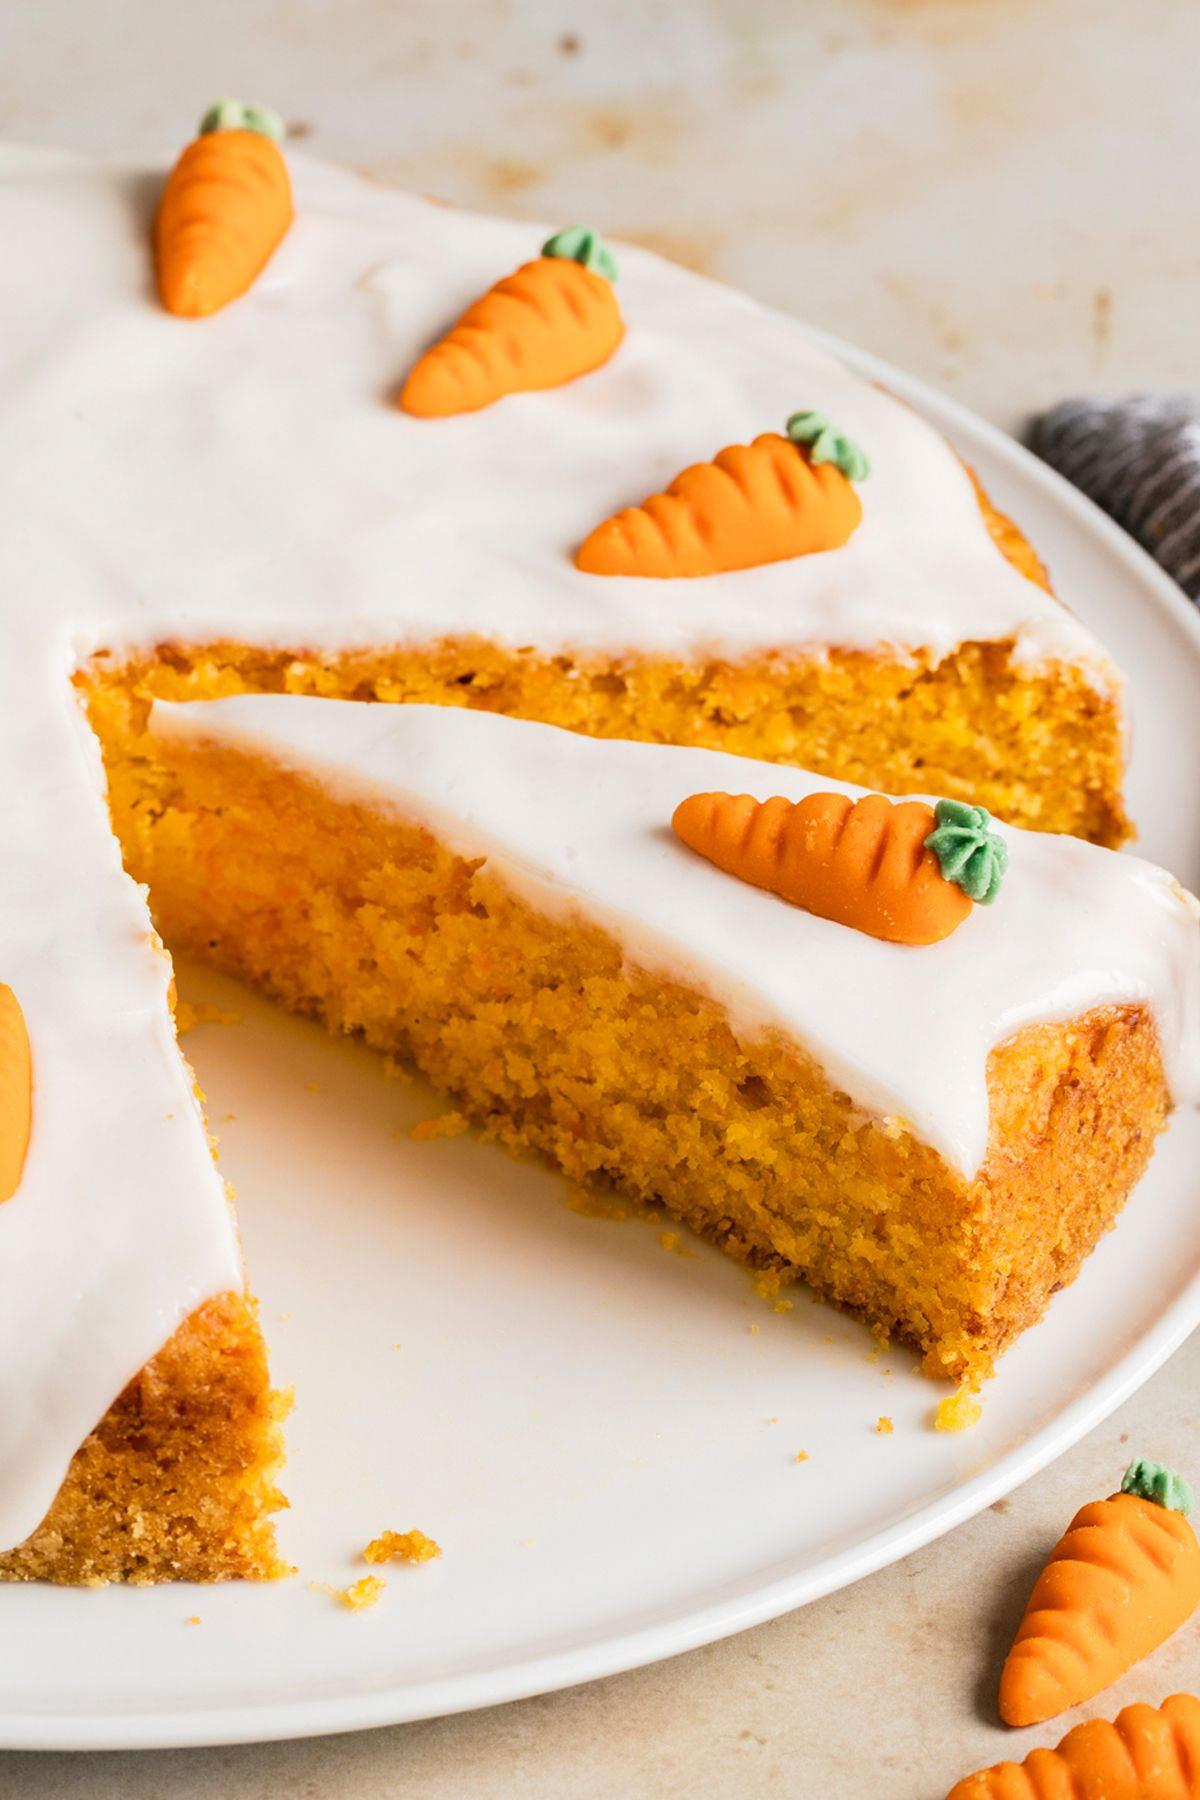 Veganer Karottenkuchen Rezept Ohne Zucker Die Besten Backrezepte Mit Gelinggarantie Rezept Karottenkuchen Vegan Karottenkuchen Karotten Kuchen